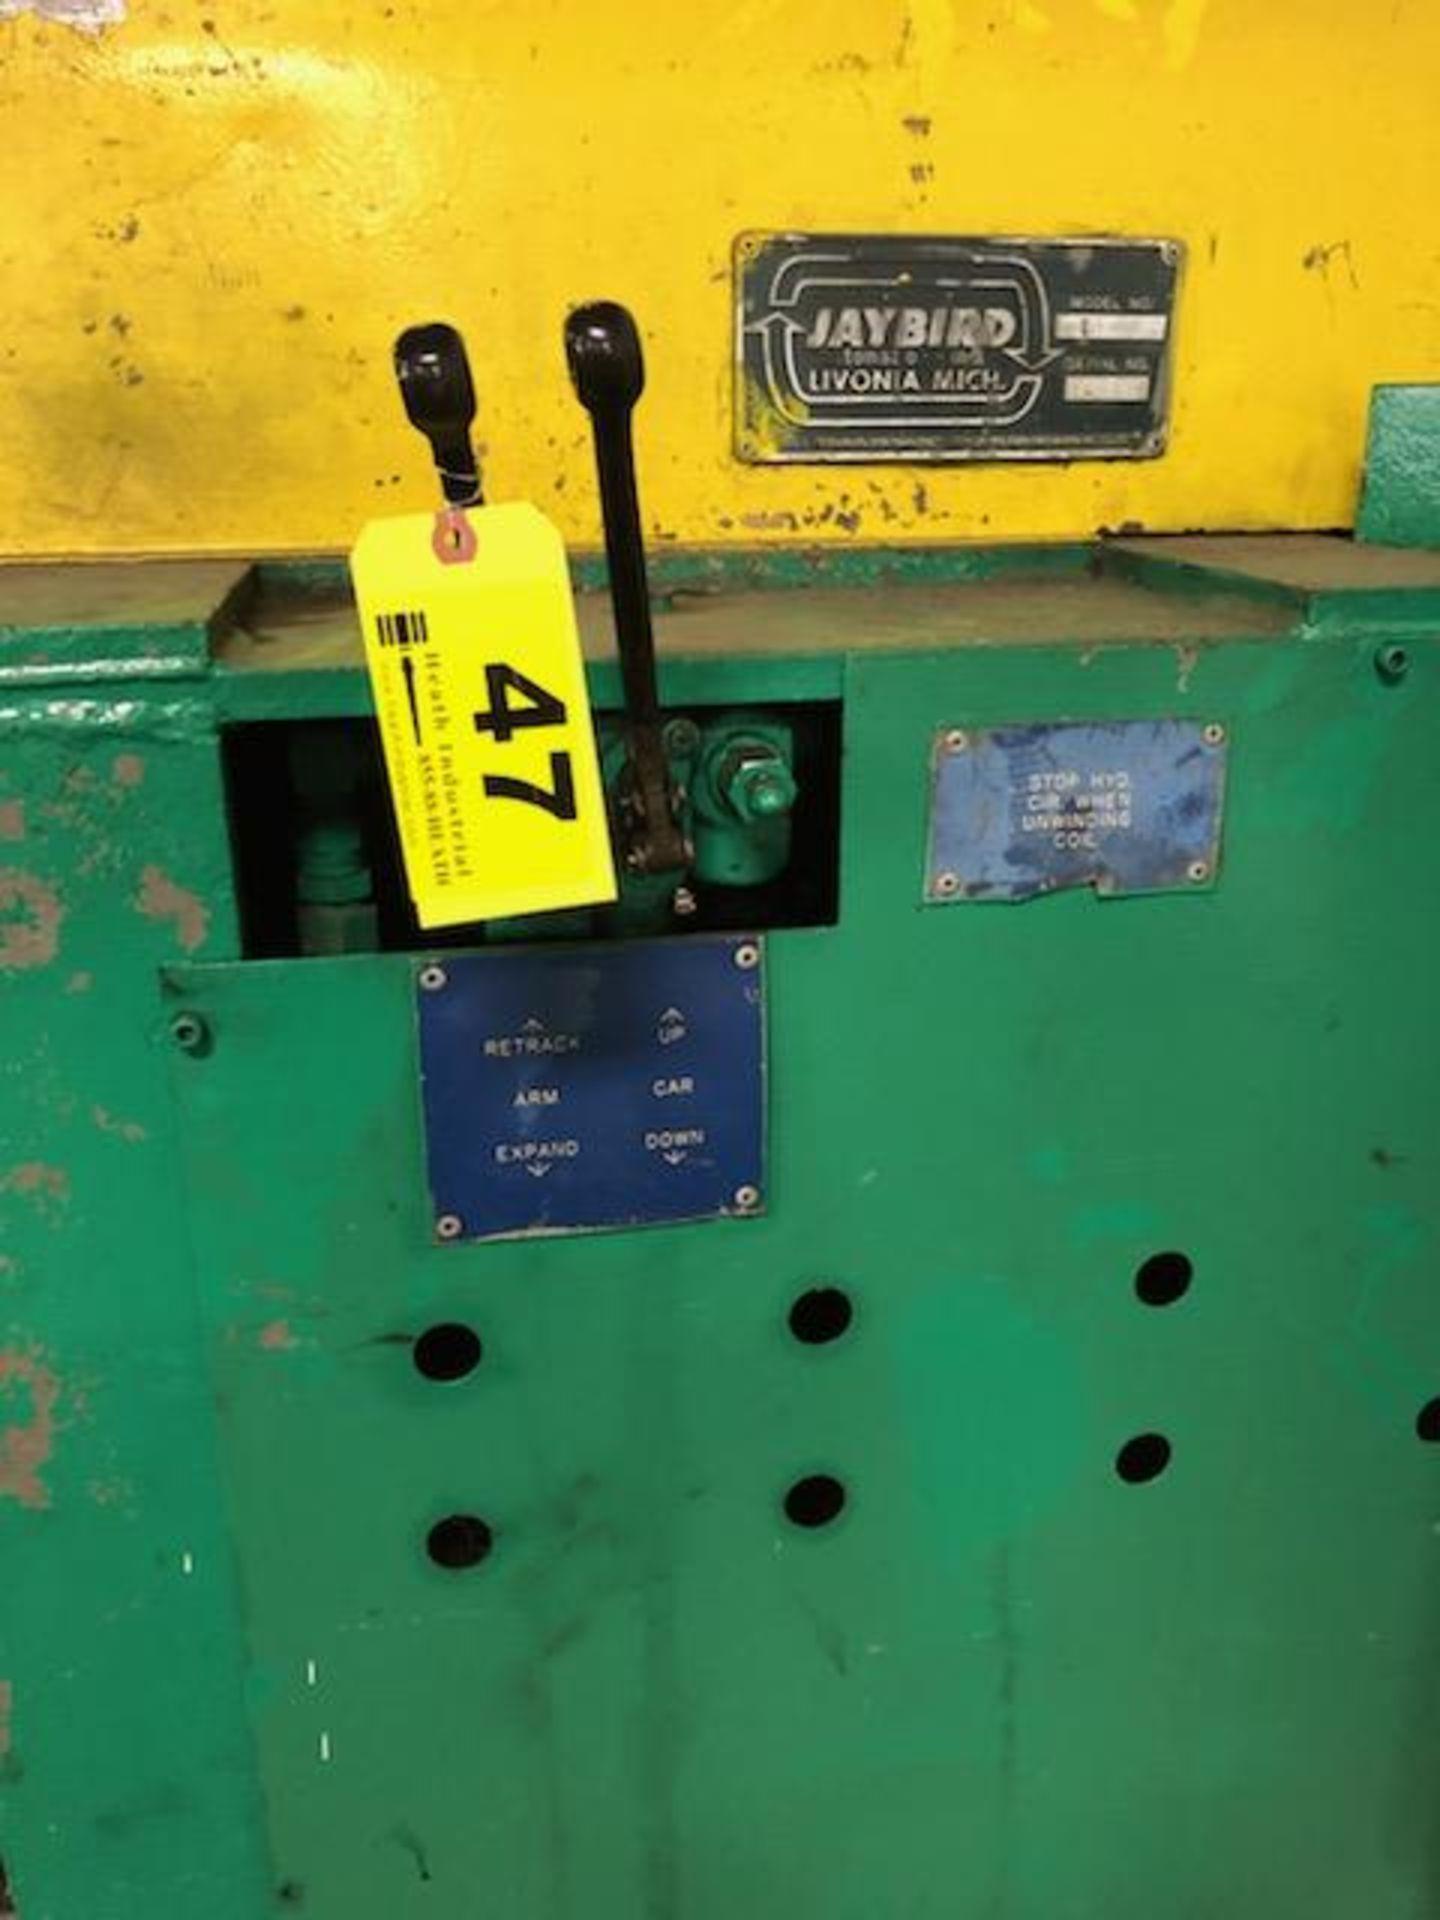 "Lot 47 - Jay Bird Model GRM10-5060 Motorized Uncoiler, Serial Number: 12428 10,000 Lbs - 60"" Width x 48"" OD -"